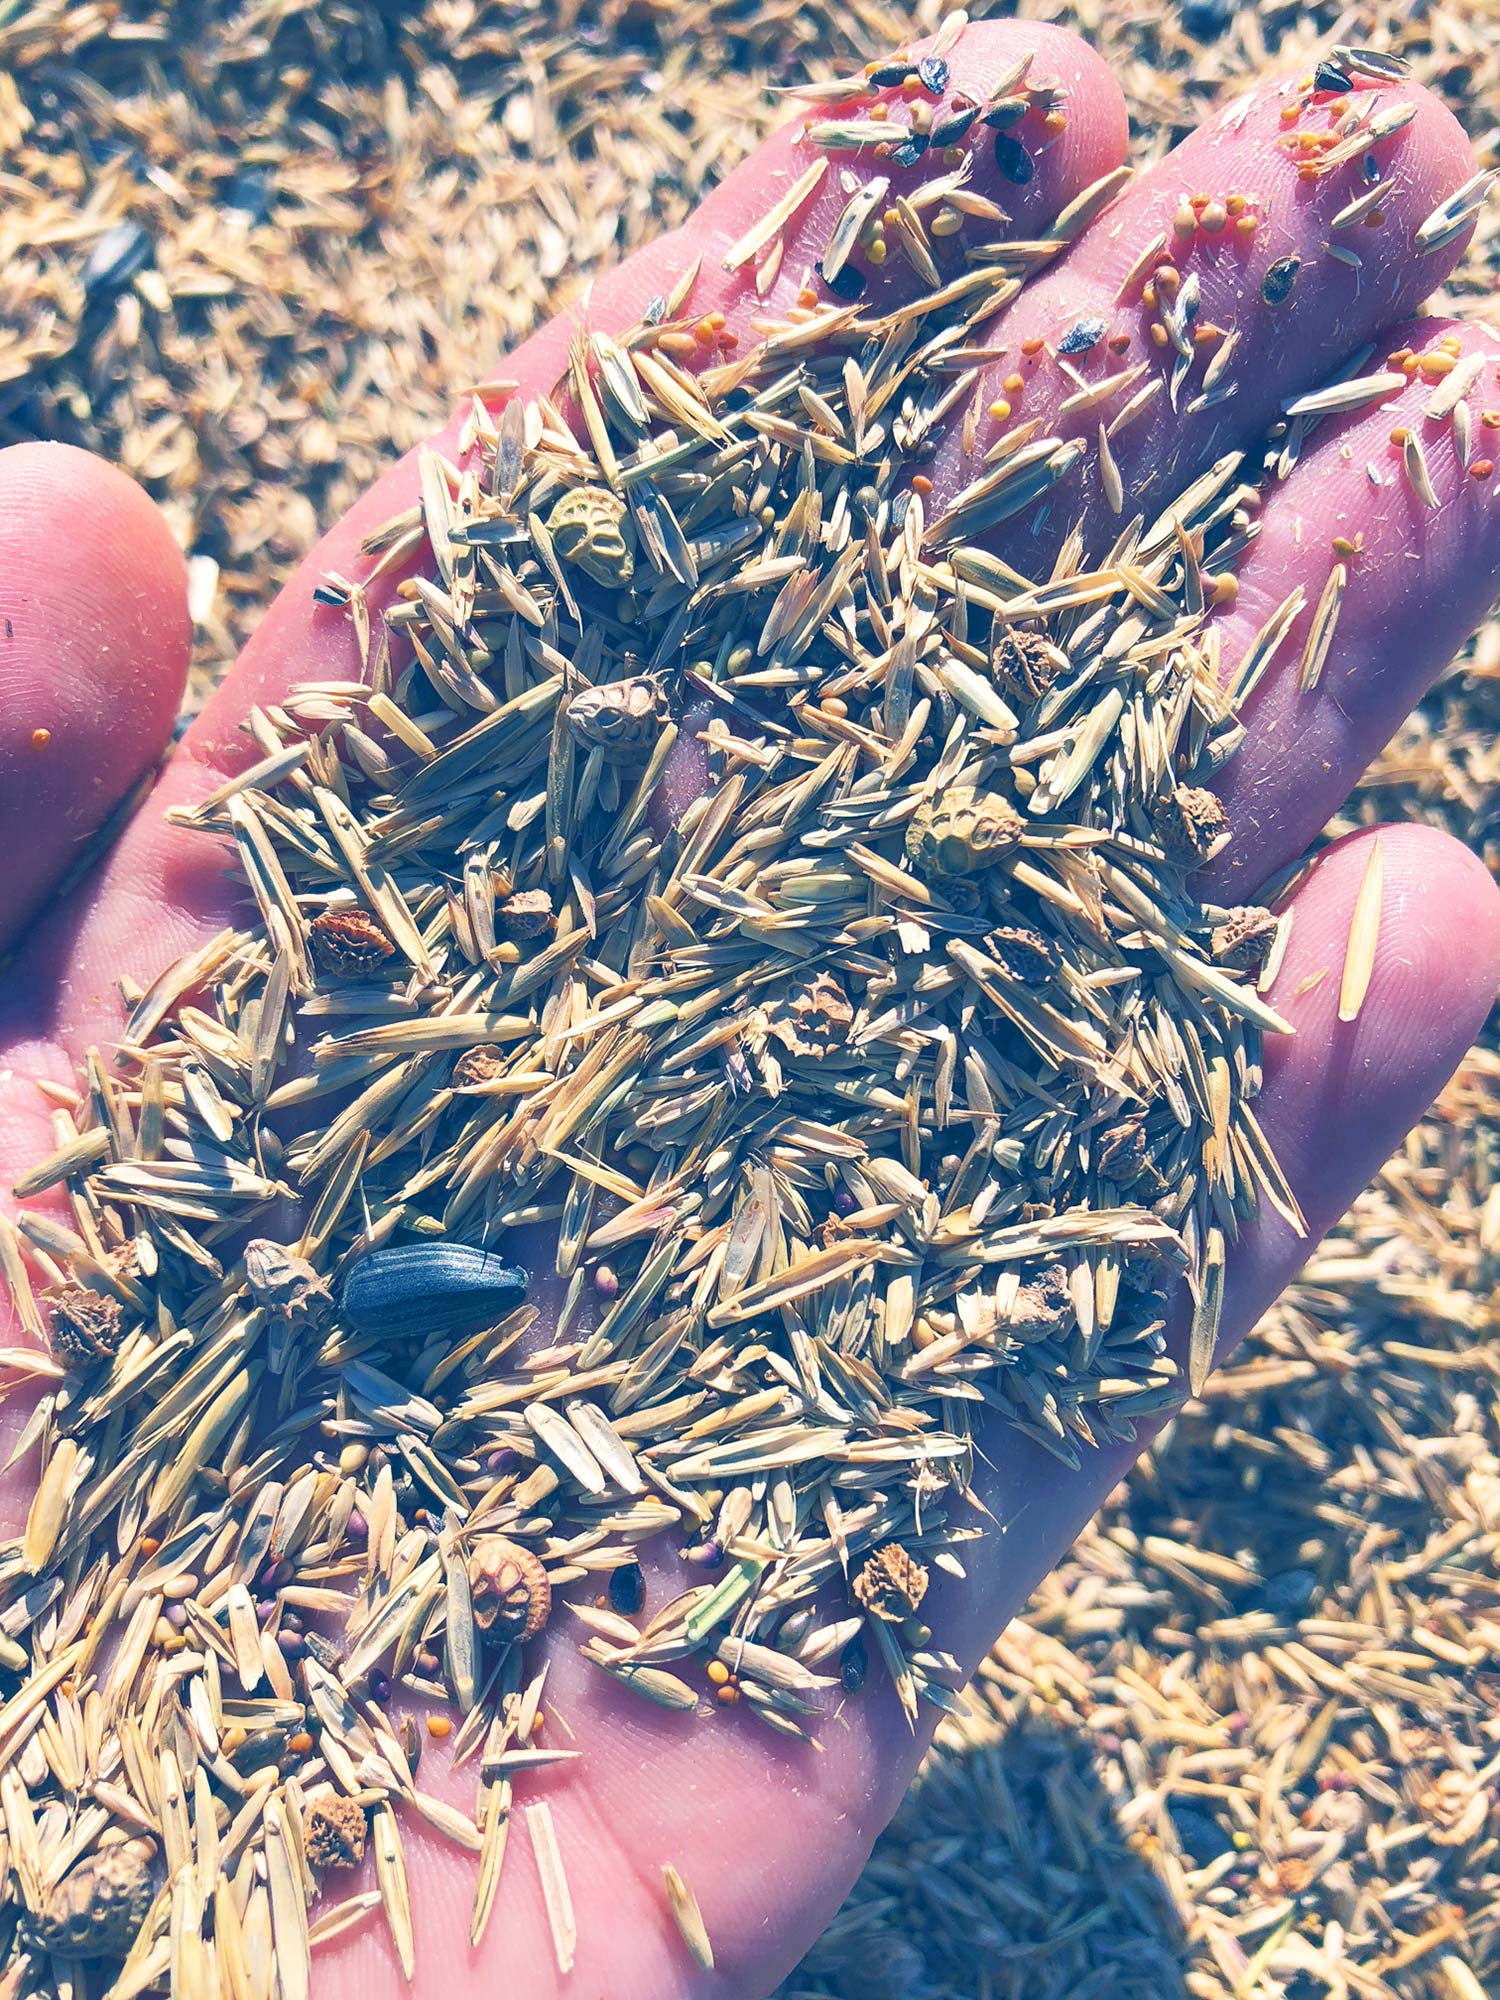 pasture_seed_mix6.jpg